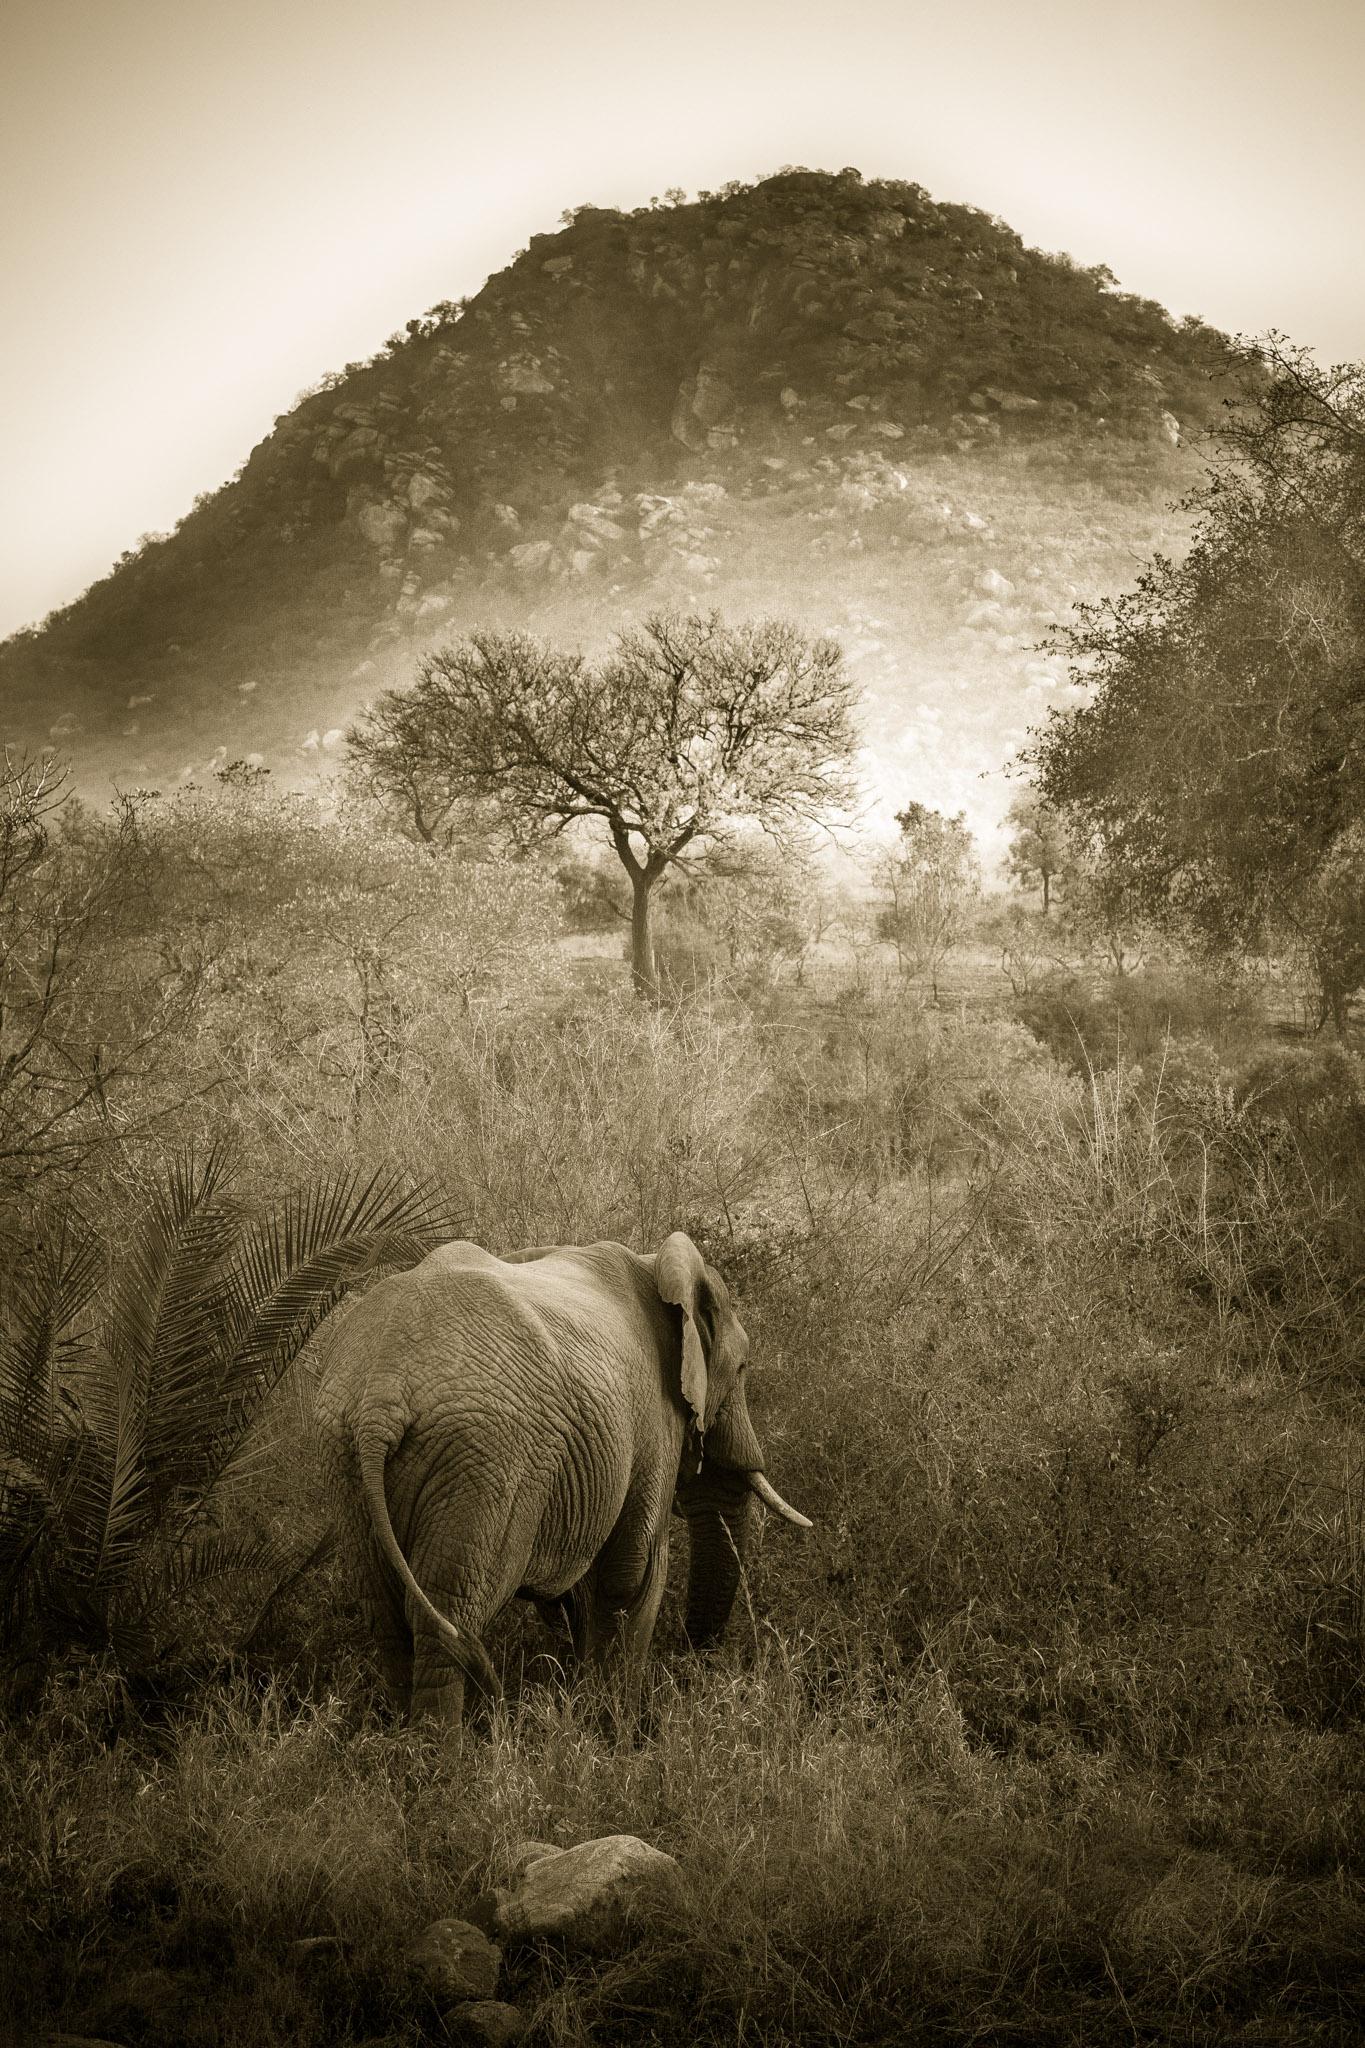 Sepia Tone - Elephant, Berg-en-Dal, Kruger.